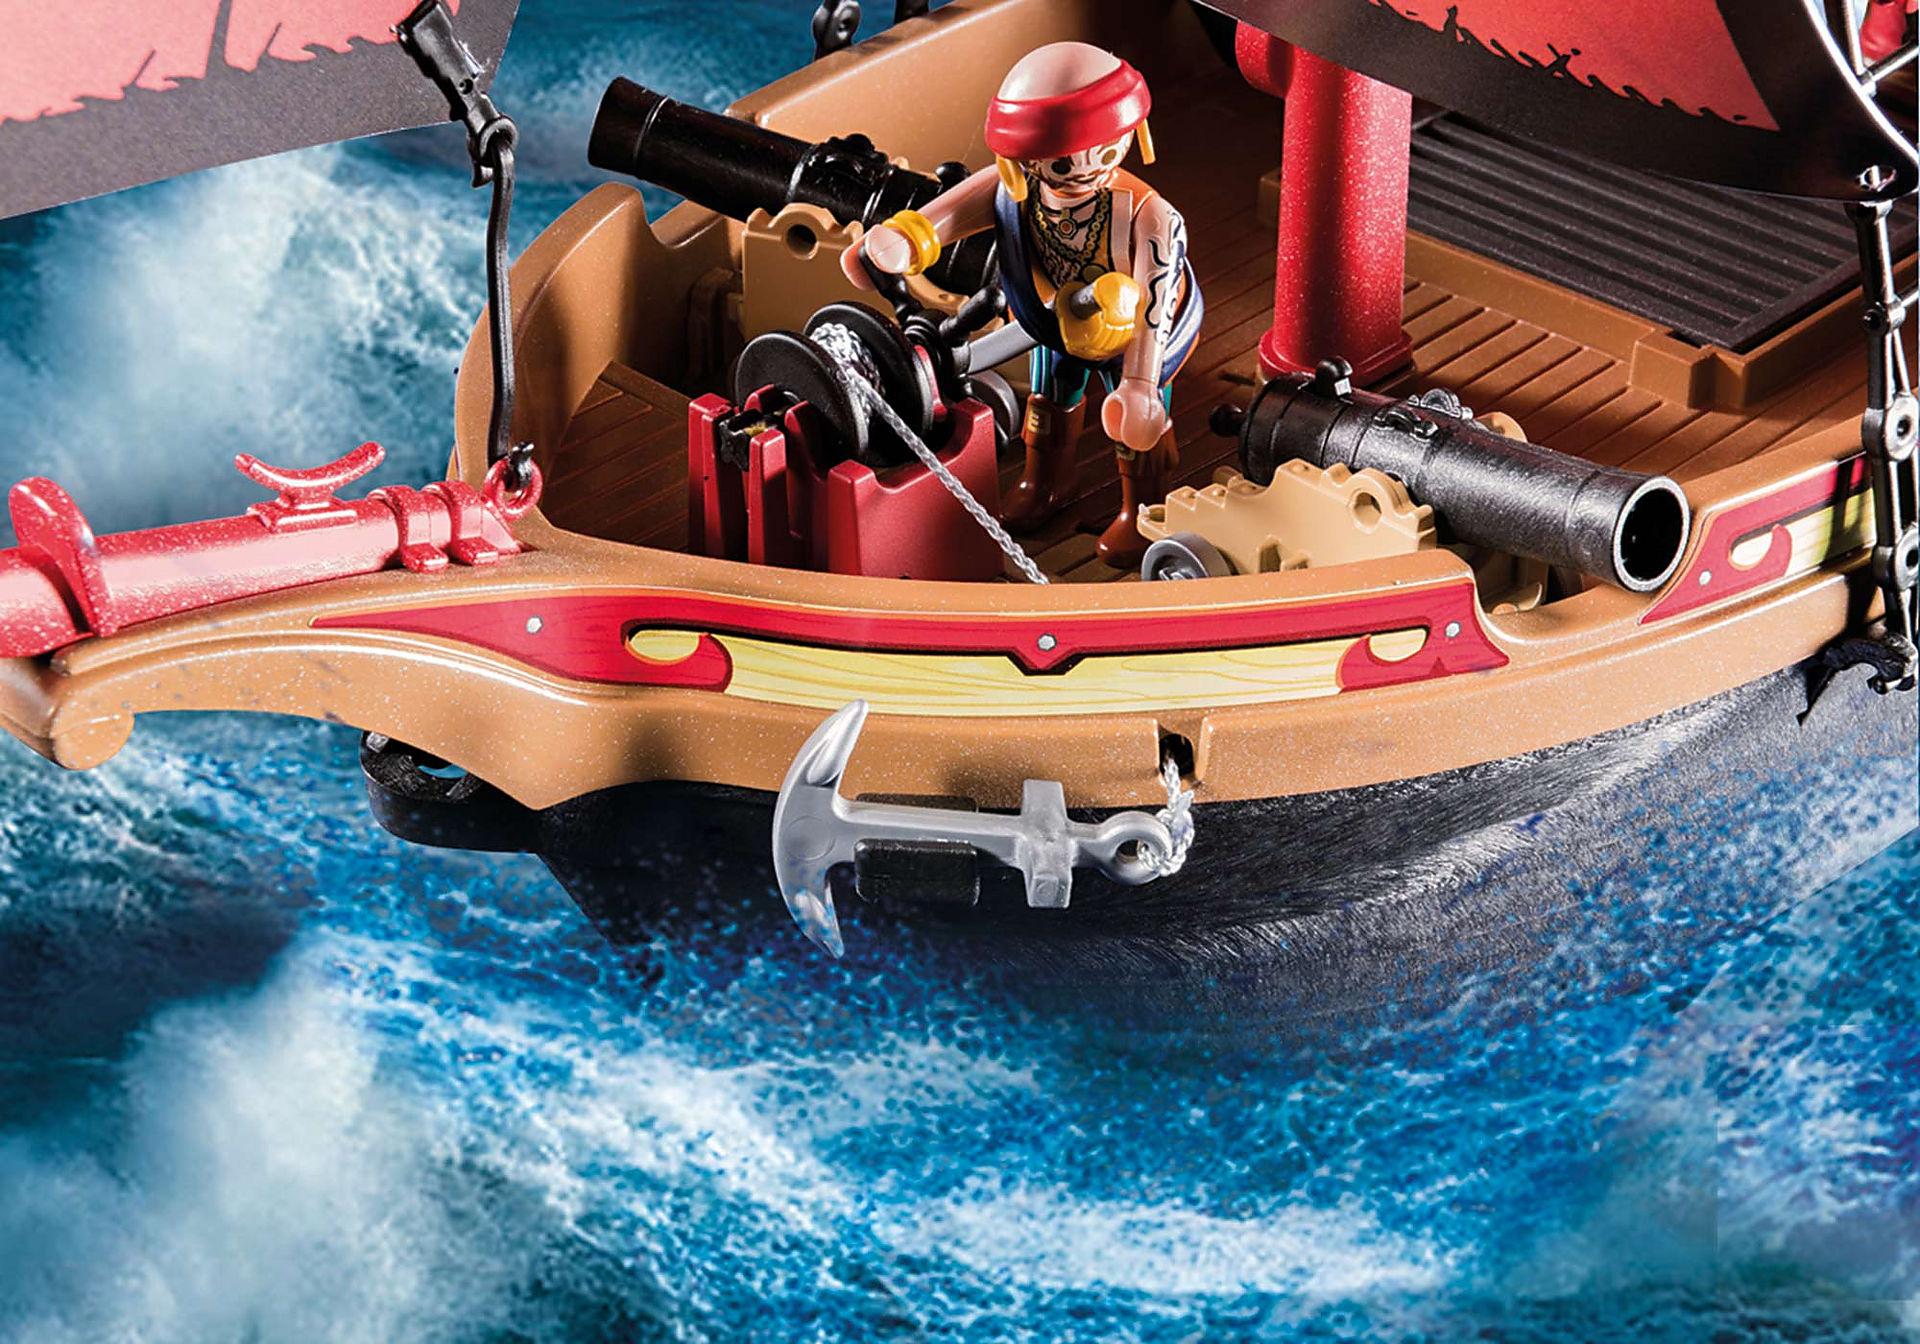 70411 Barco Pirata Calavera zoom image8